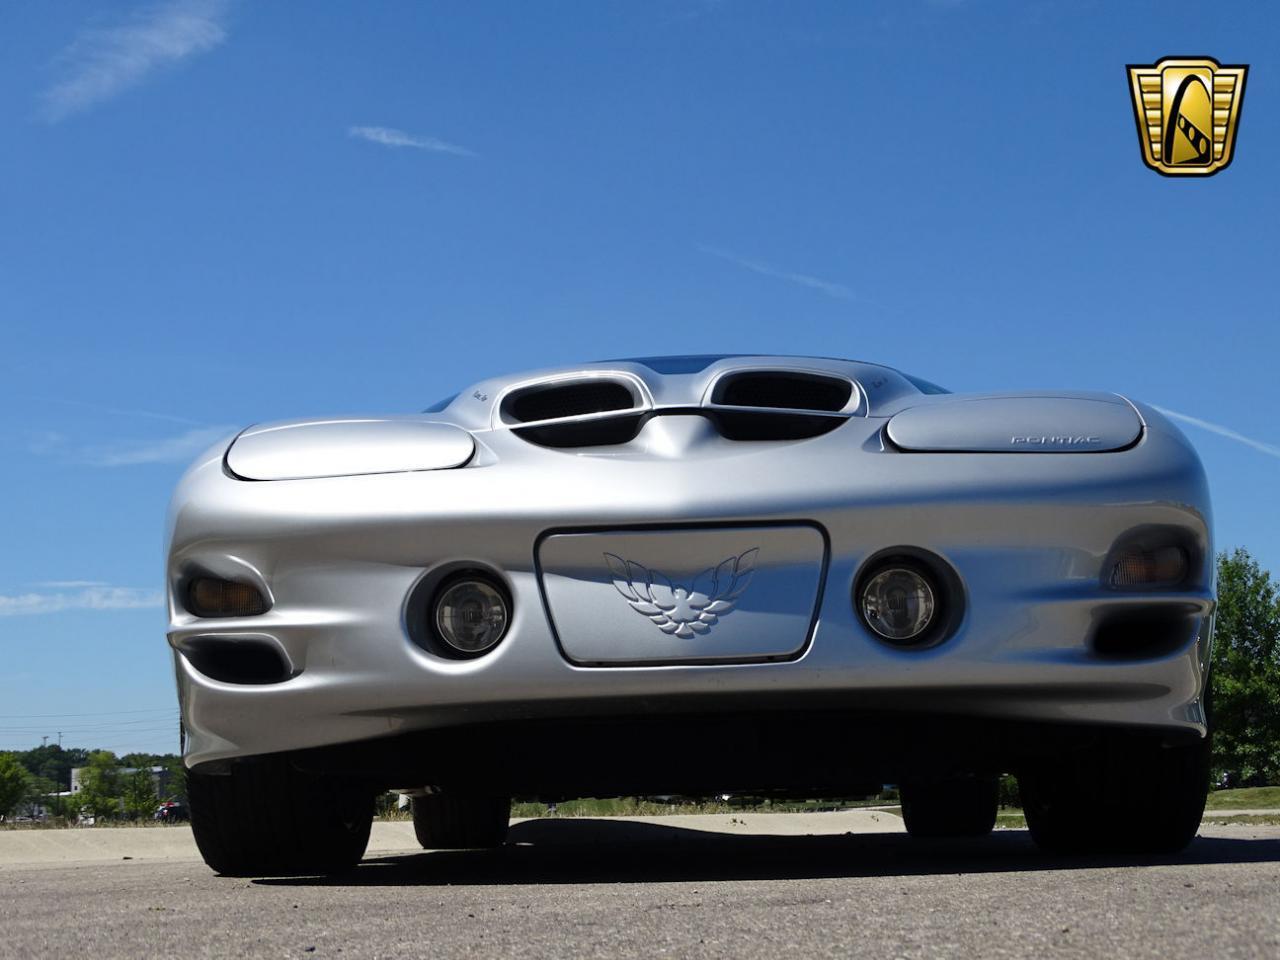 2002 Pontiac Firebird Trans Am (CC-1420061) for sale in O'Fallon, Illinois